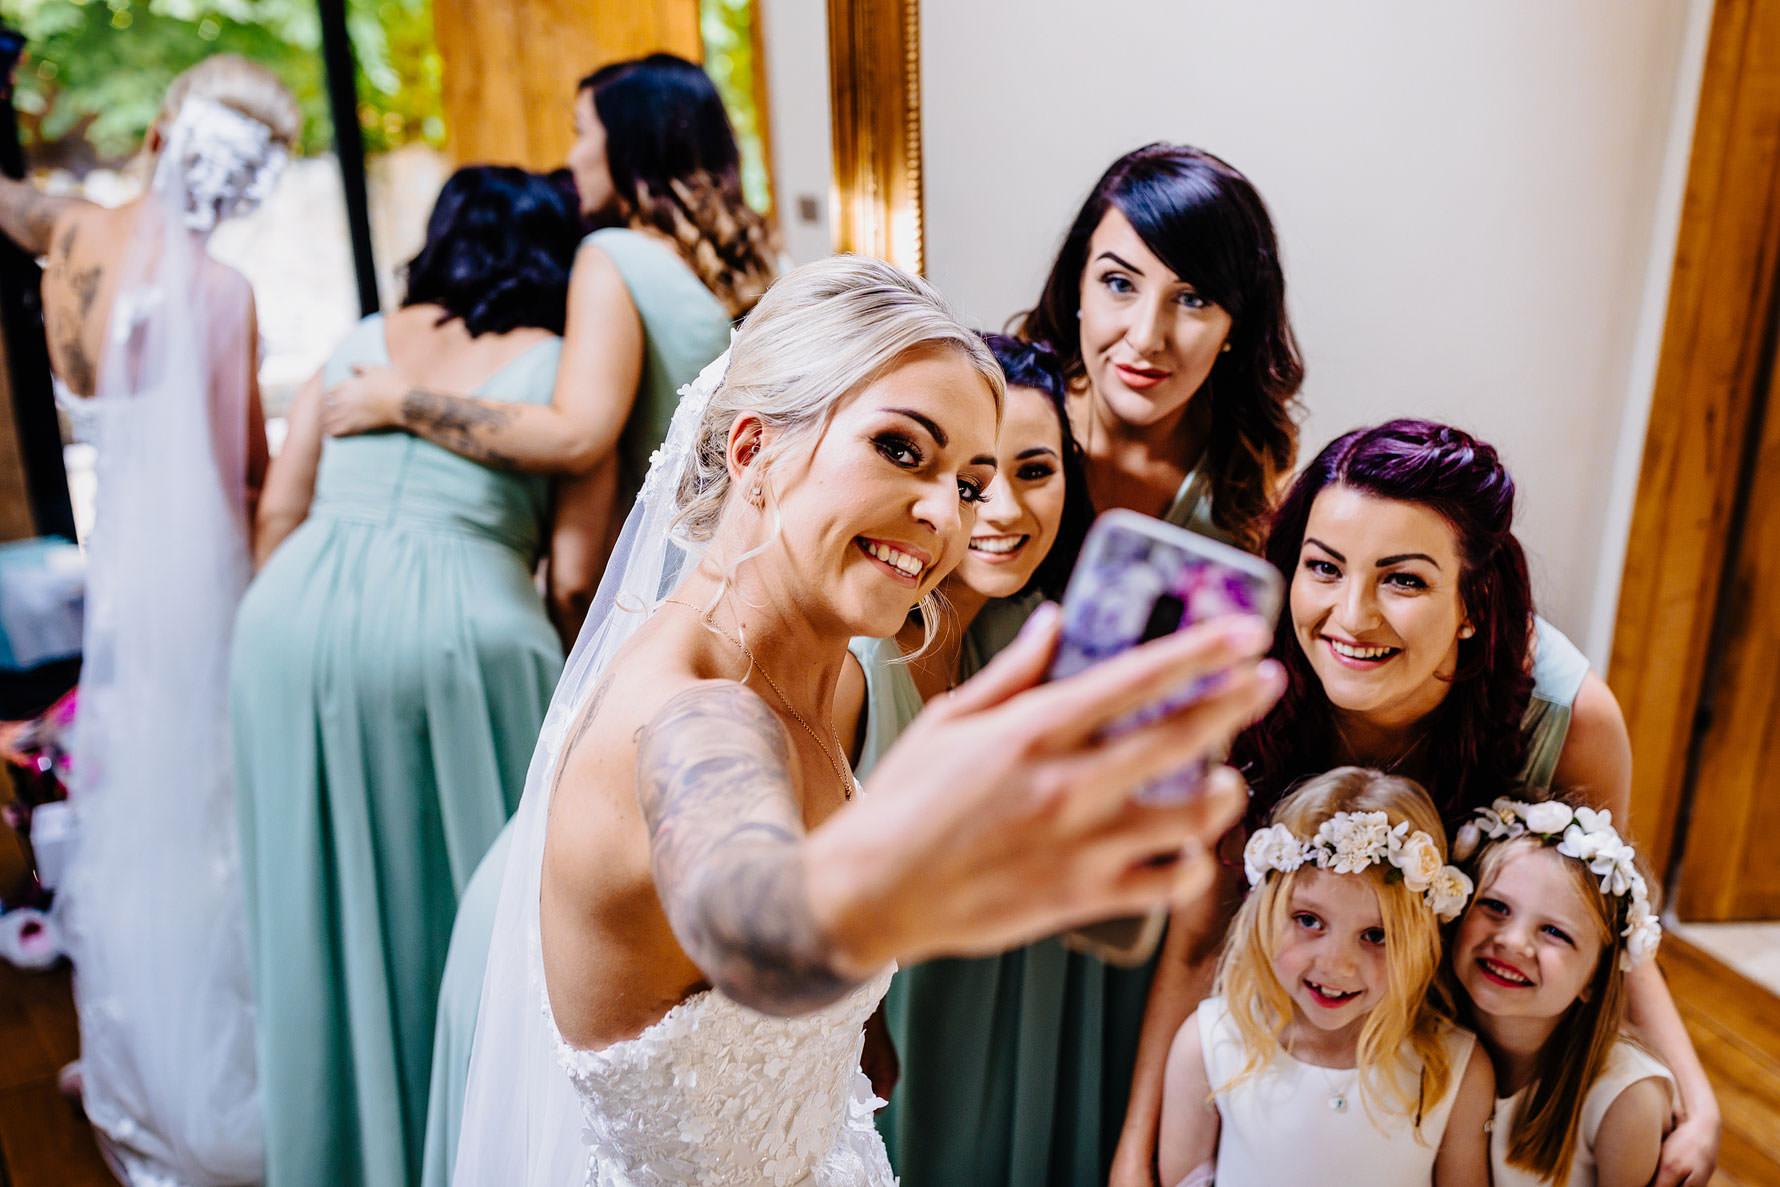 a bride taking a photograph